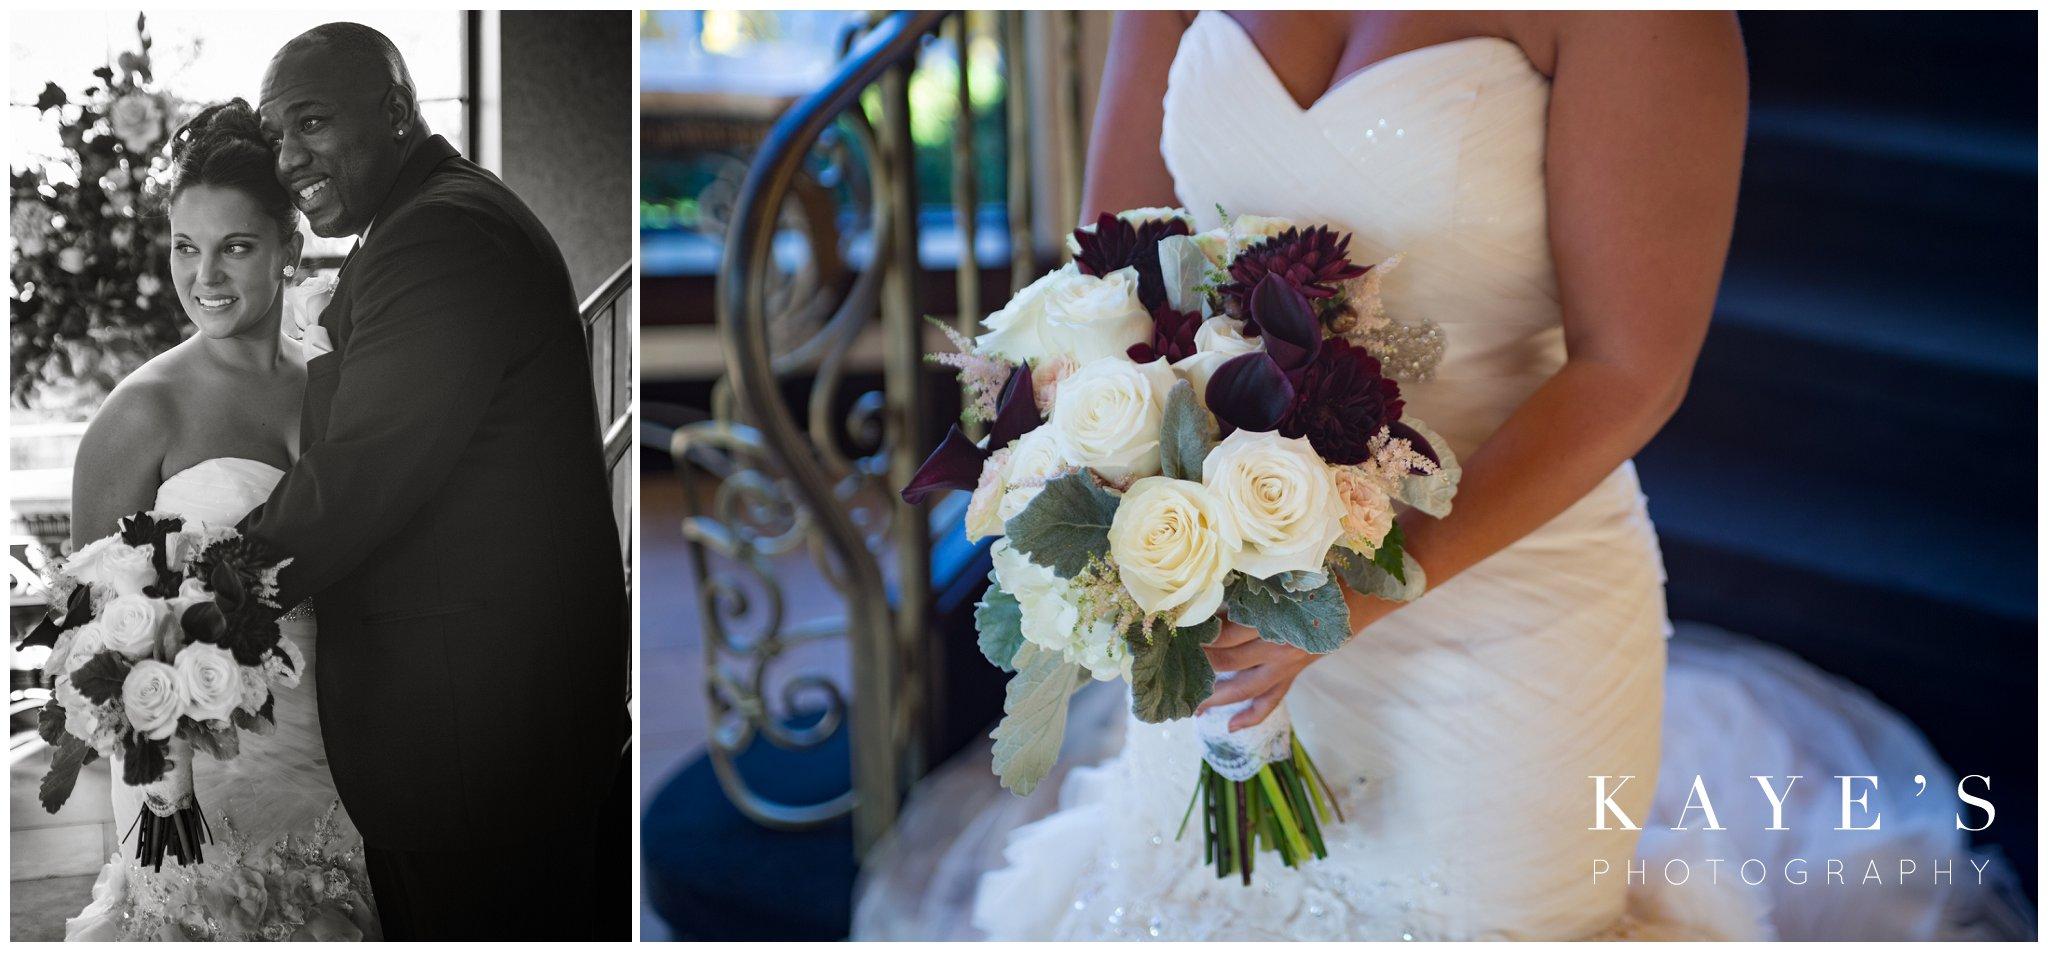 Kayes Photography- howell-michigan-wedding-photographer_0645.jpg